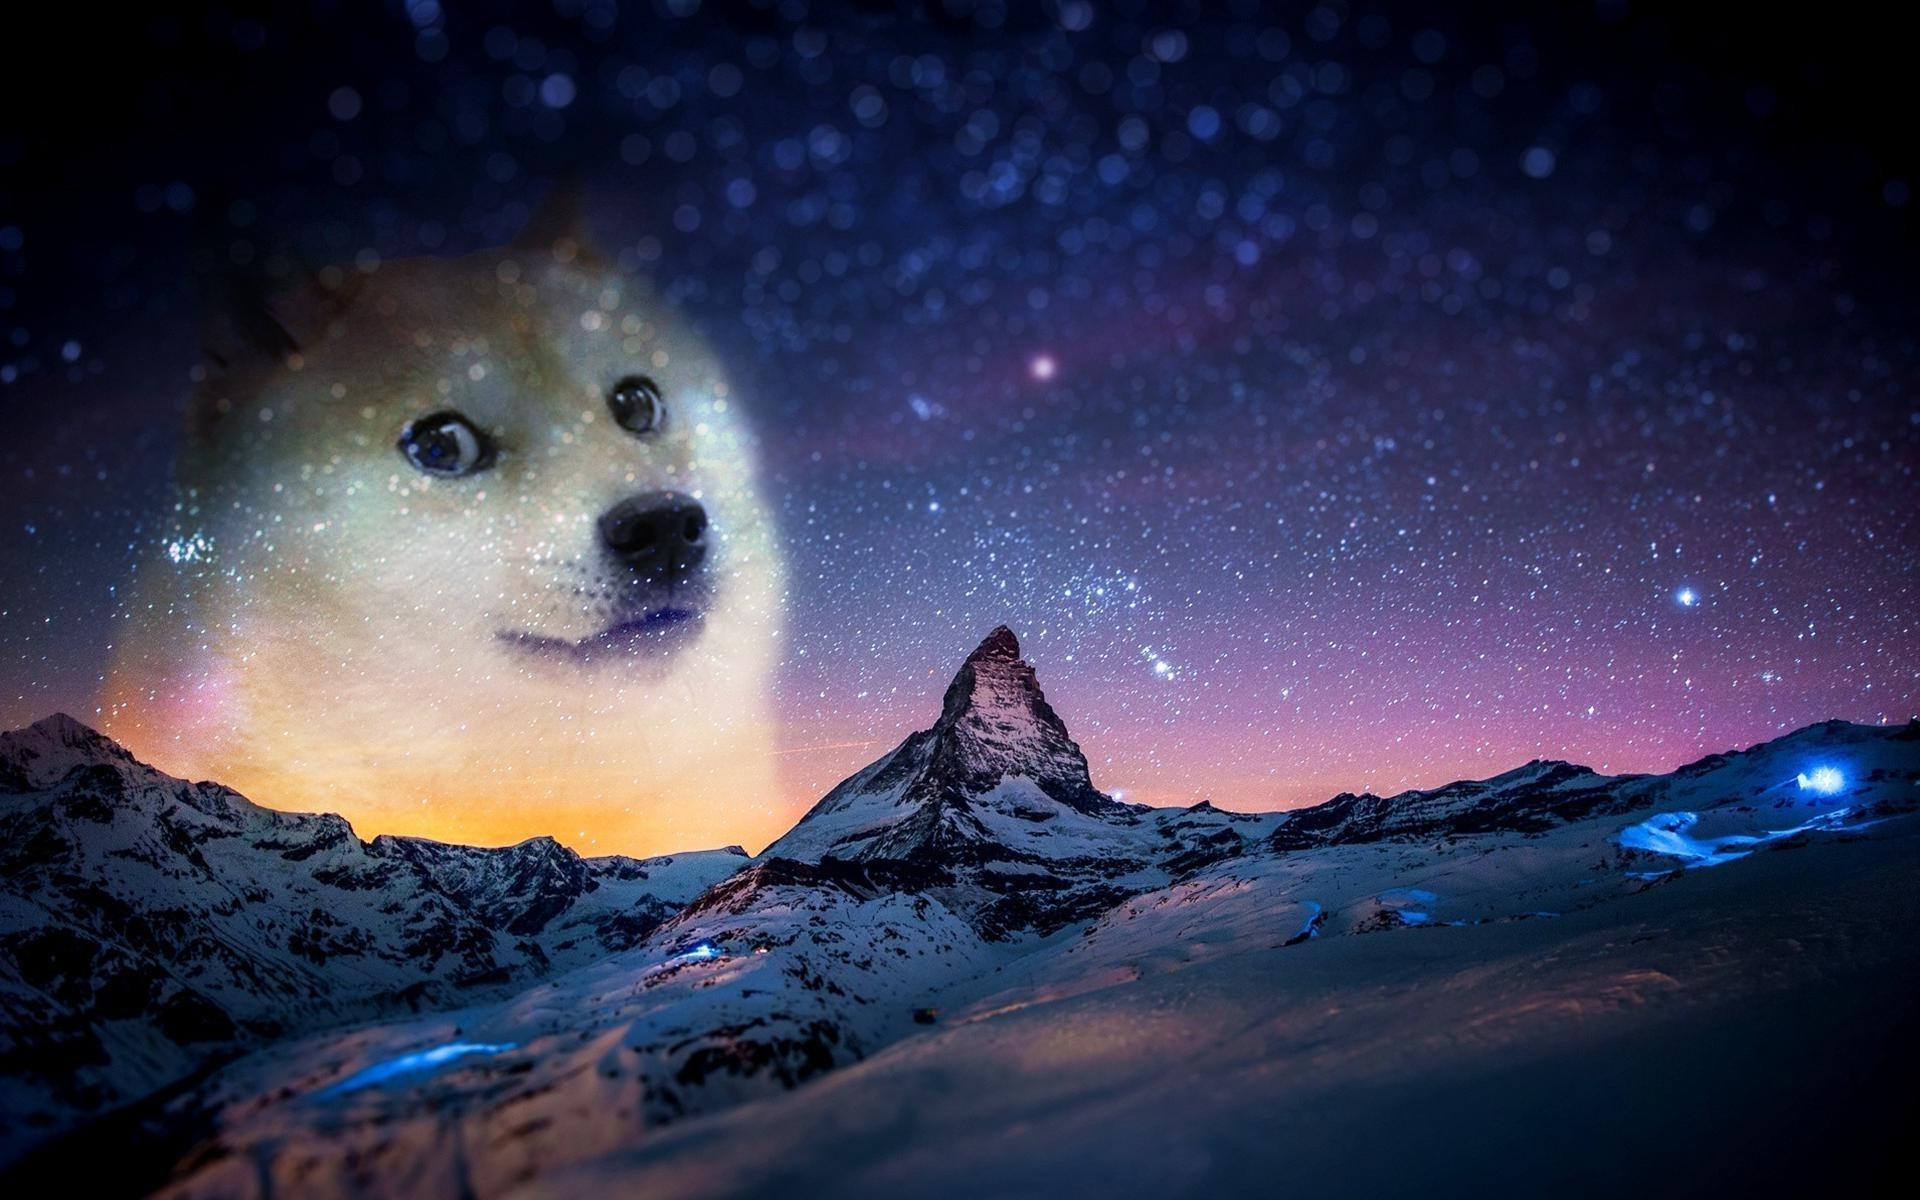 1920x1200 Doge Wallpaper High Quality